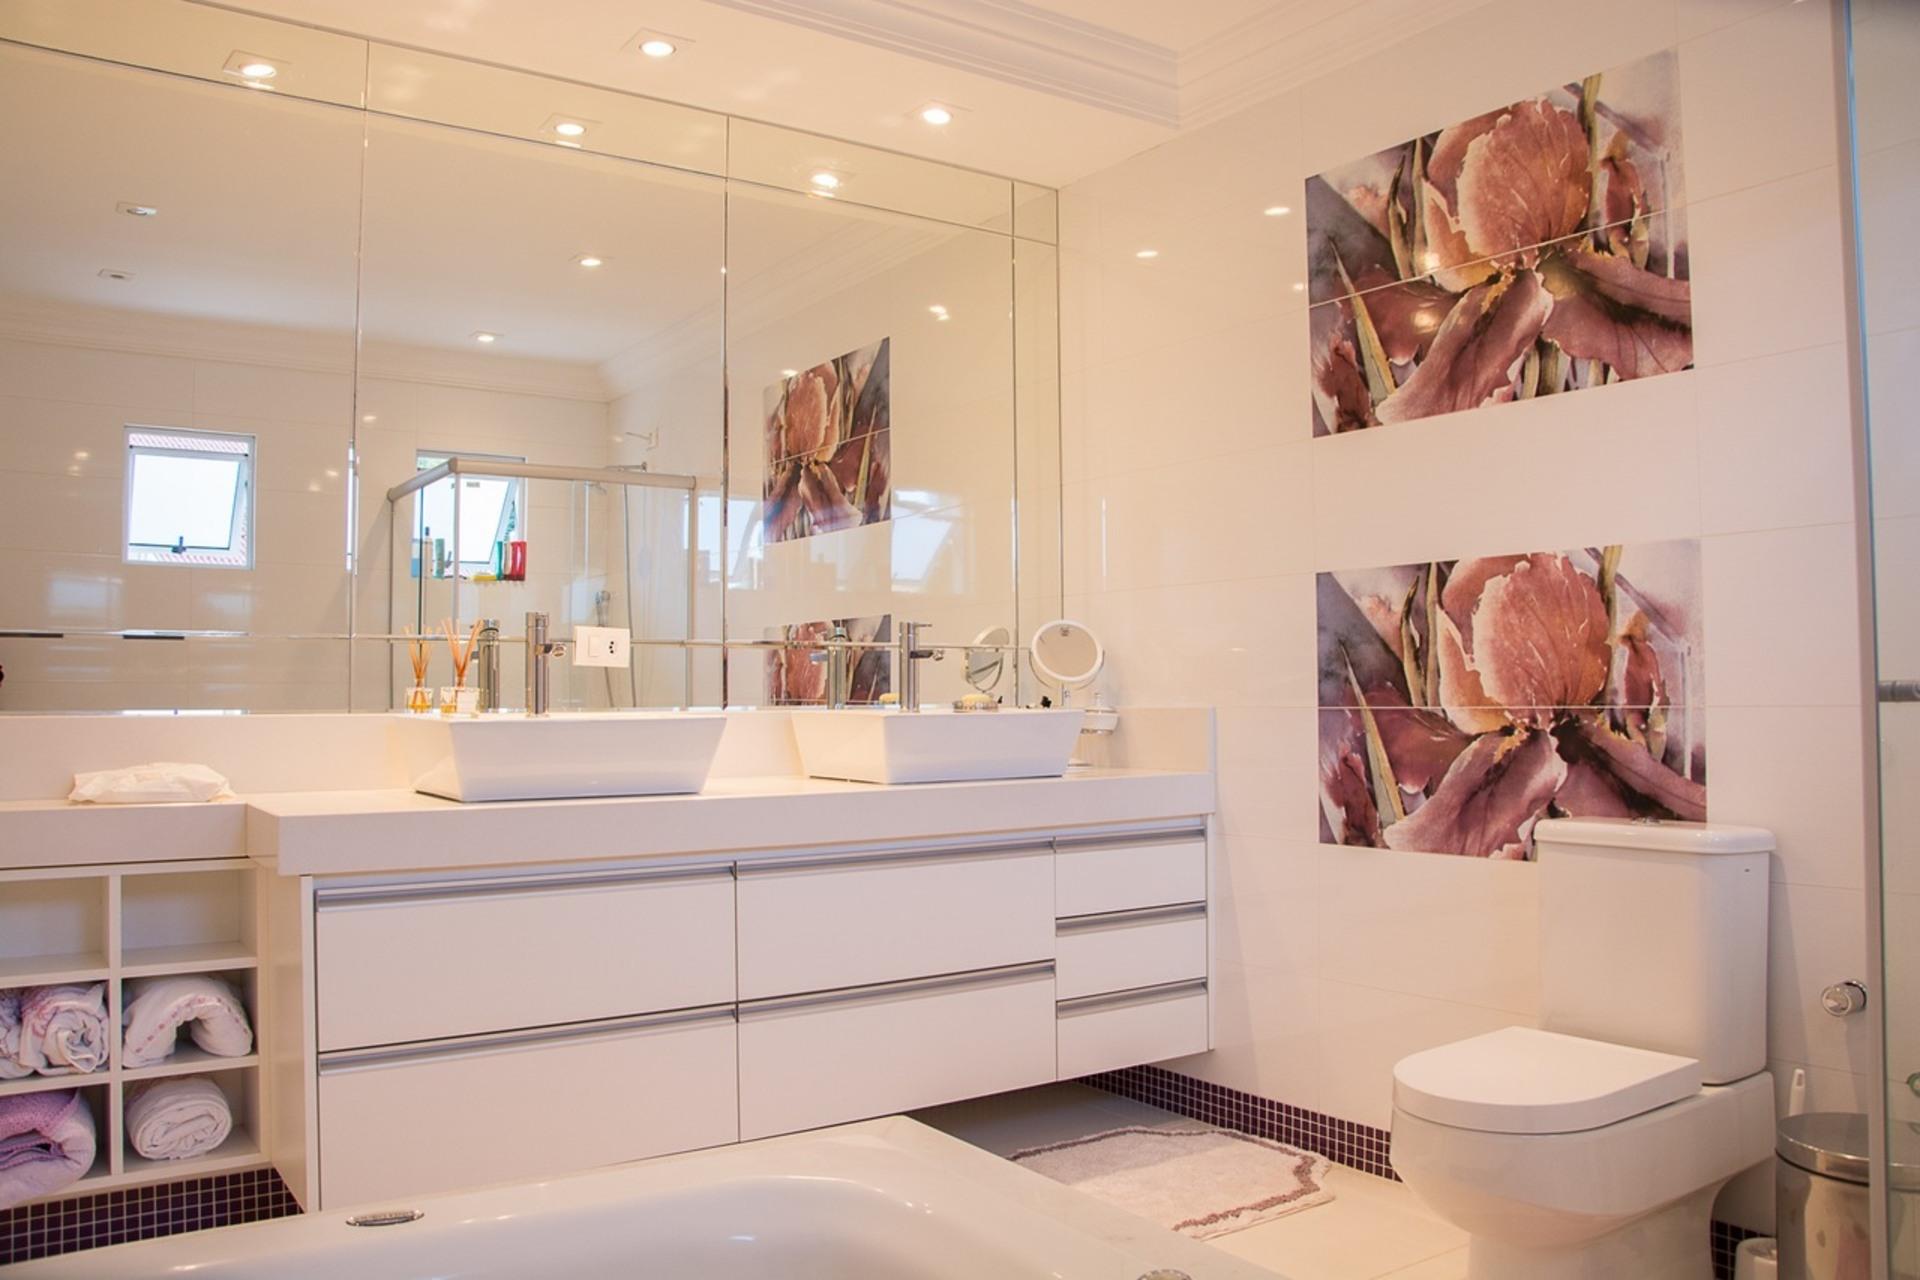 image 2 - MX - Casa sola - MX En venta Ciudad de México Cuauhtémoc - 7 habitaciones